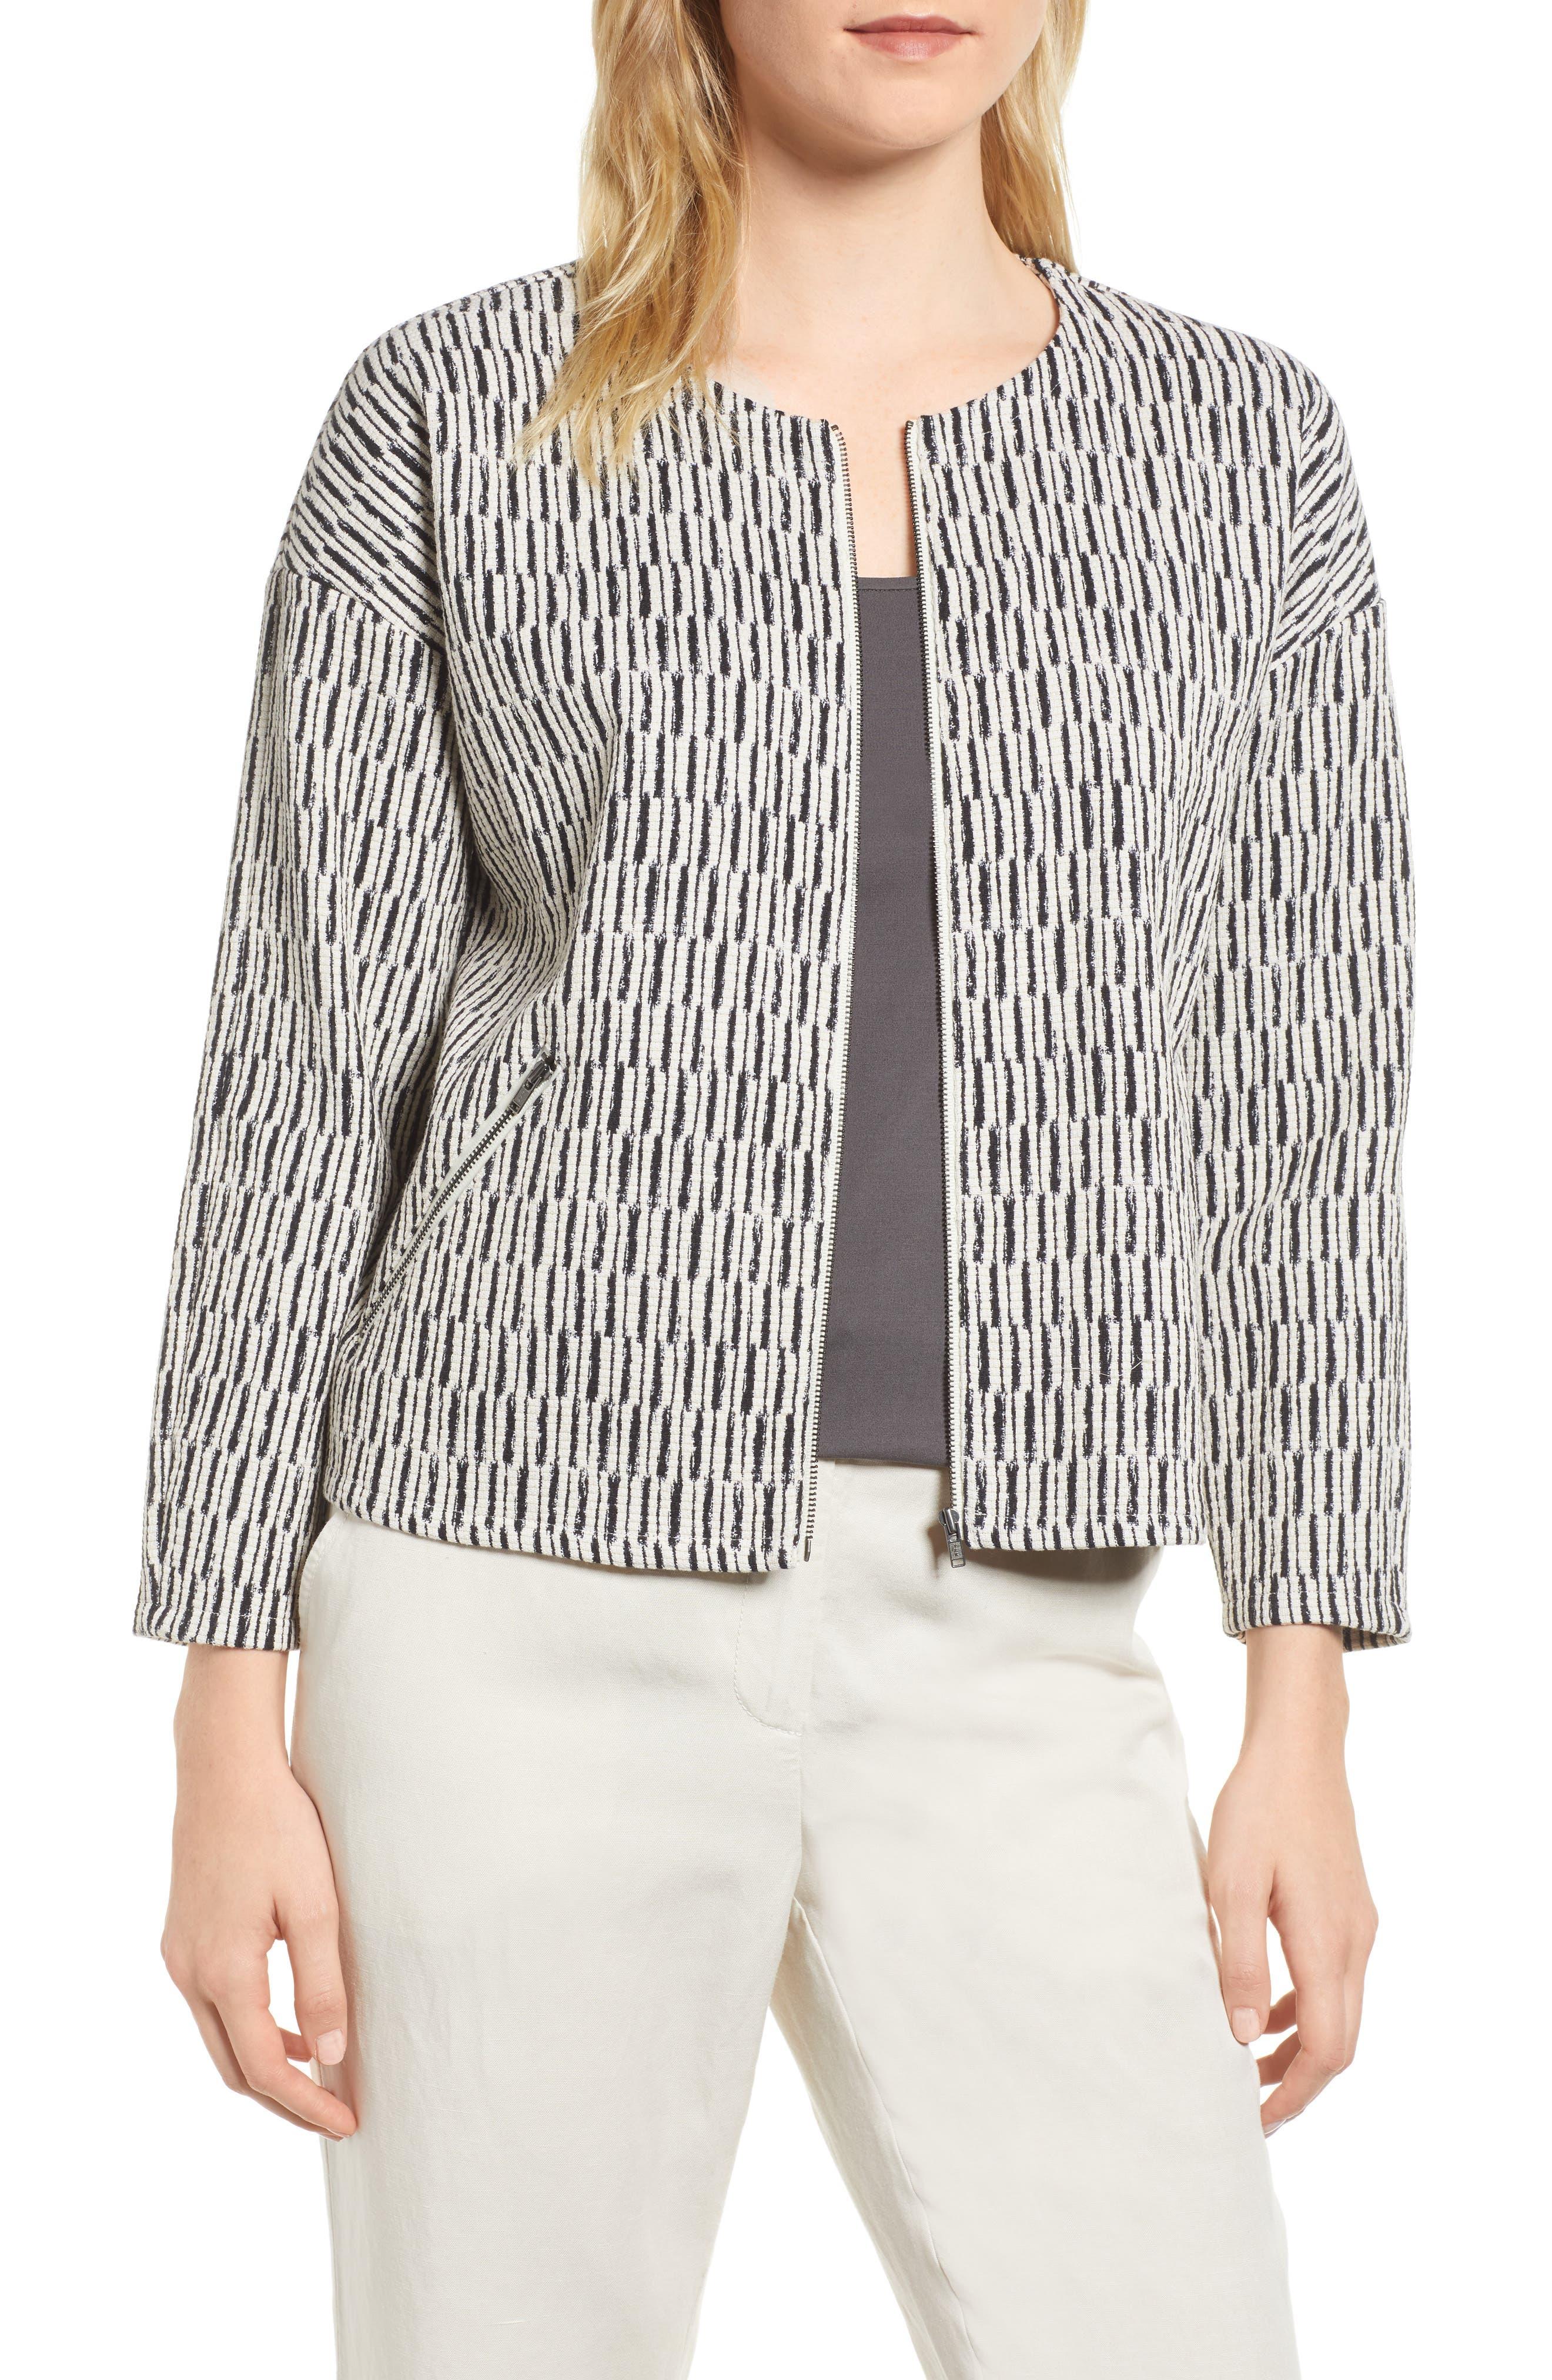 Tweed Jacket,                         Main,                         color, Black/ White